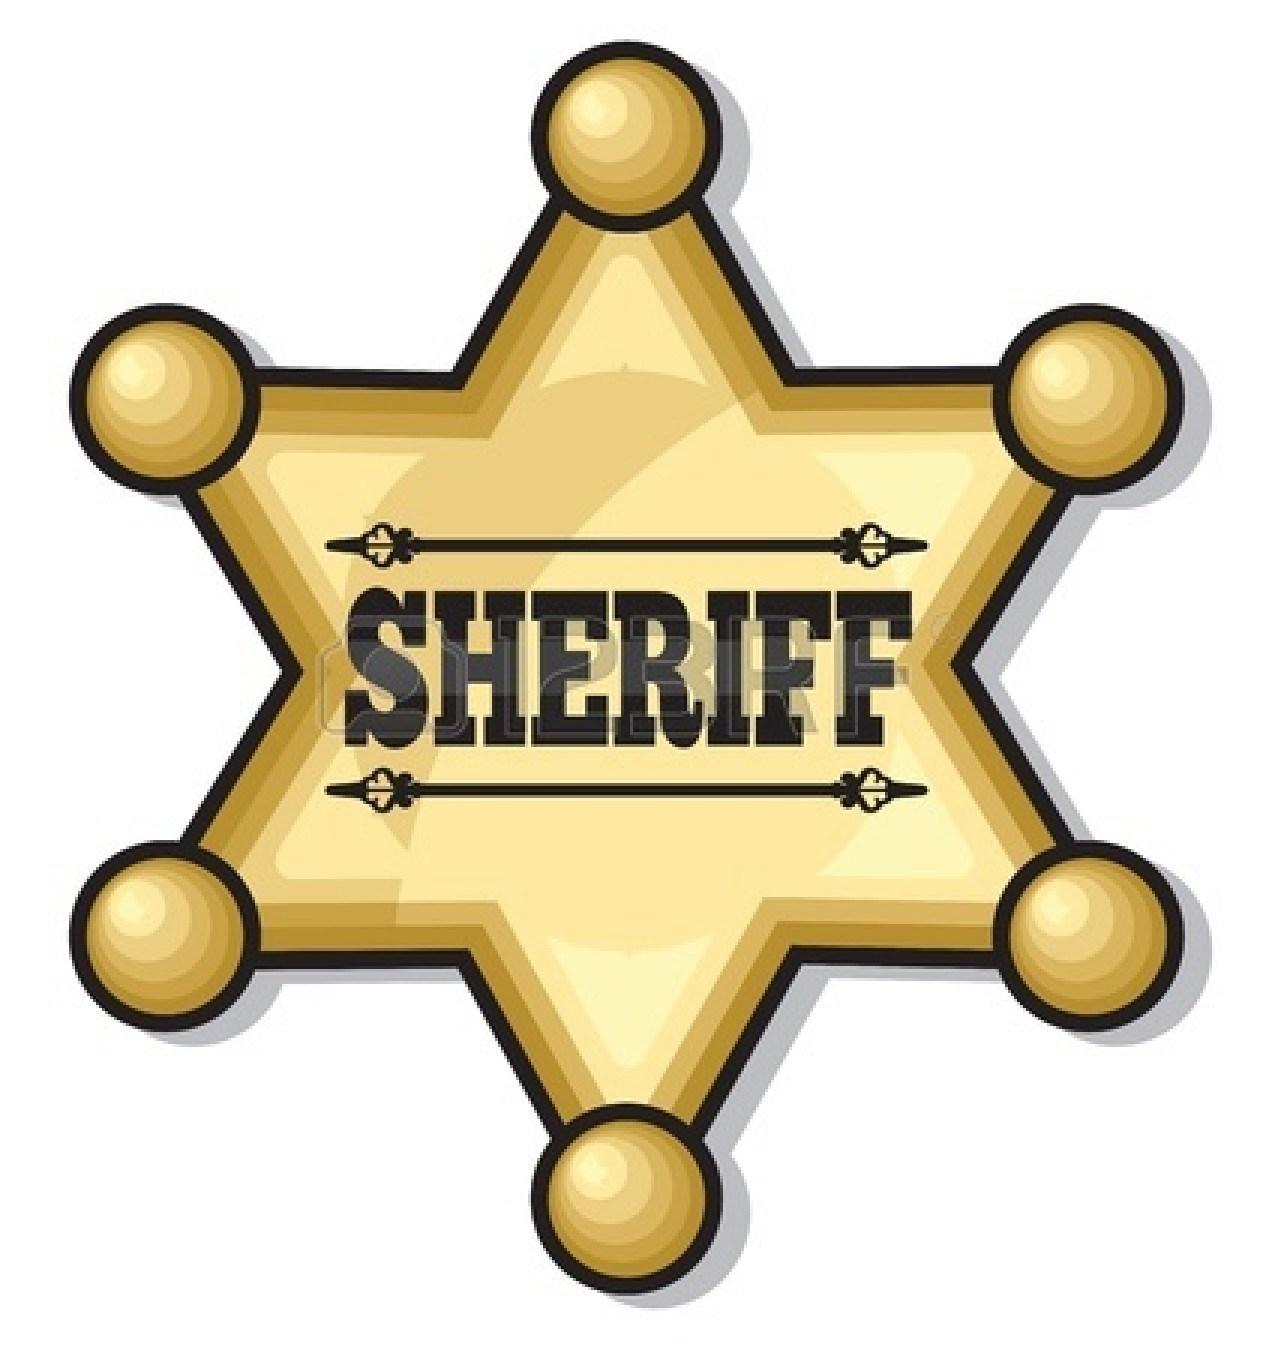 Sheriff badge clipart jpg free library Sheriff badge clipart free 8 » Clipart Portal jpg free library